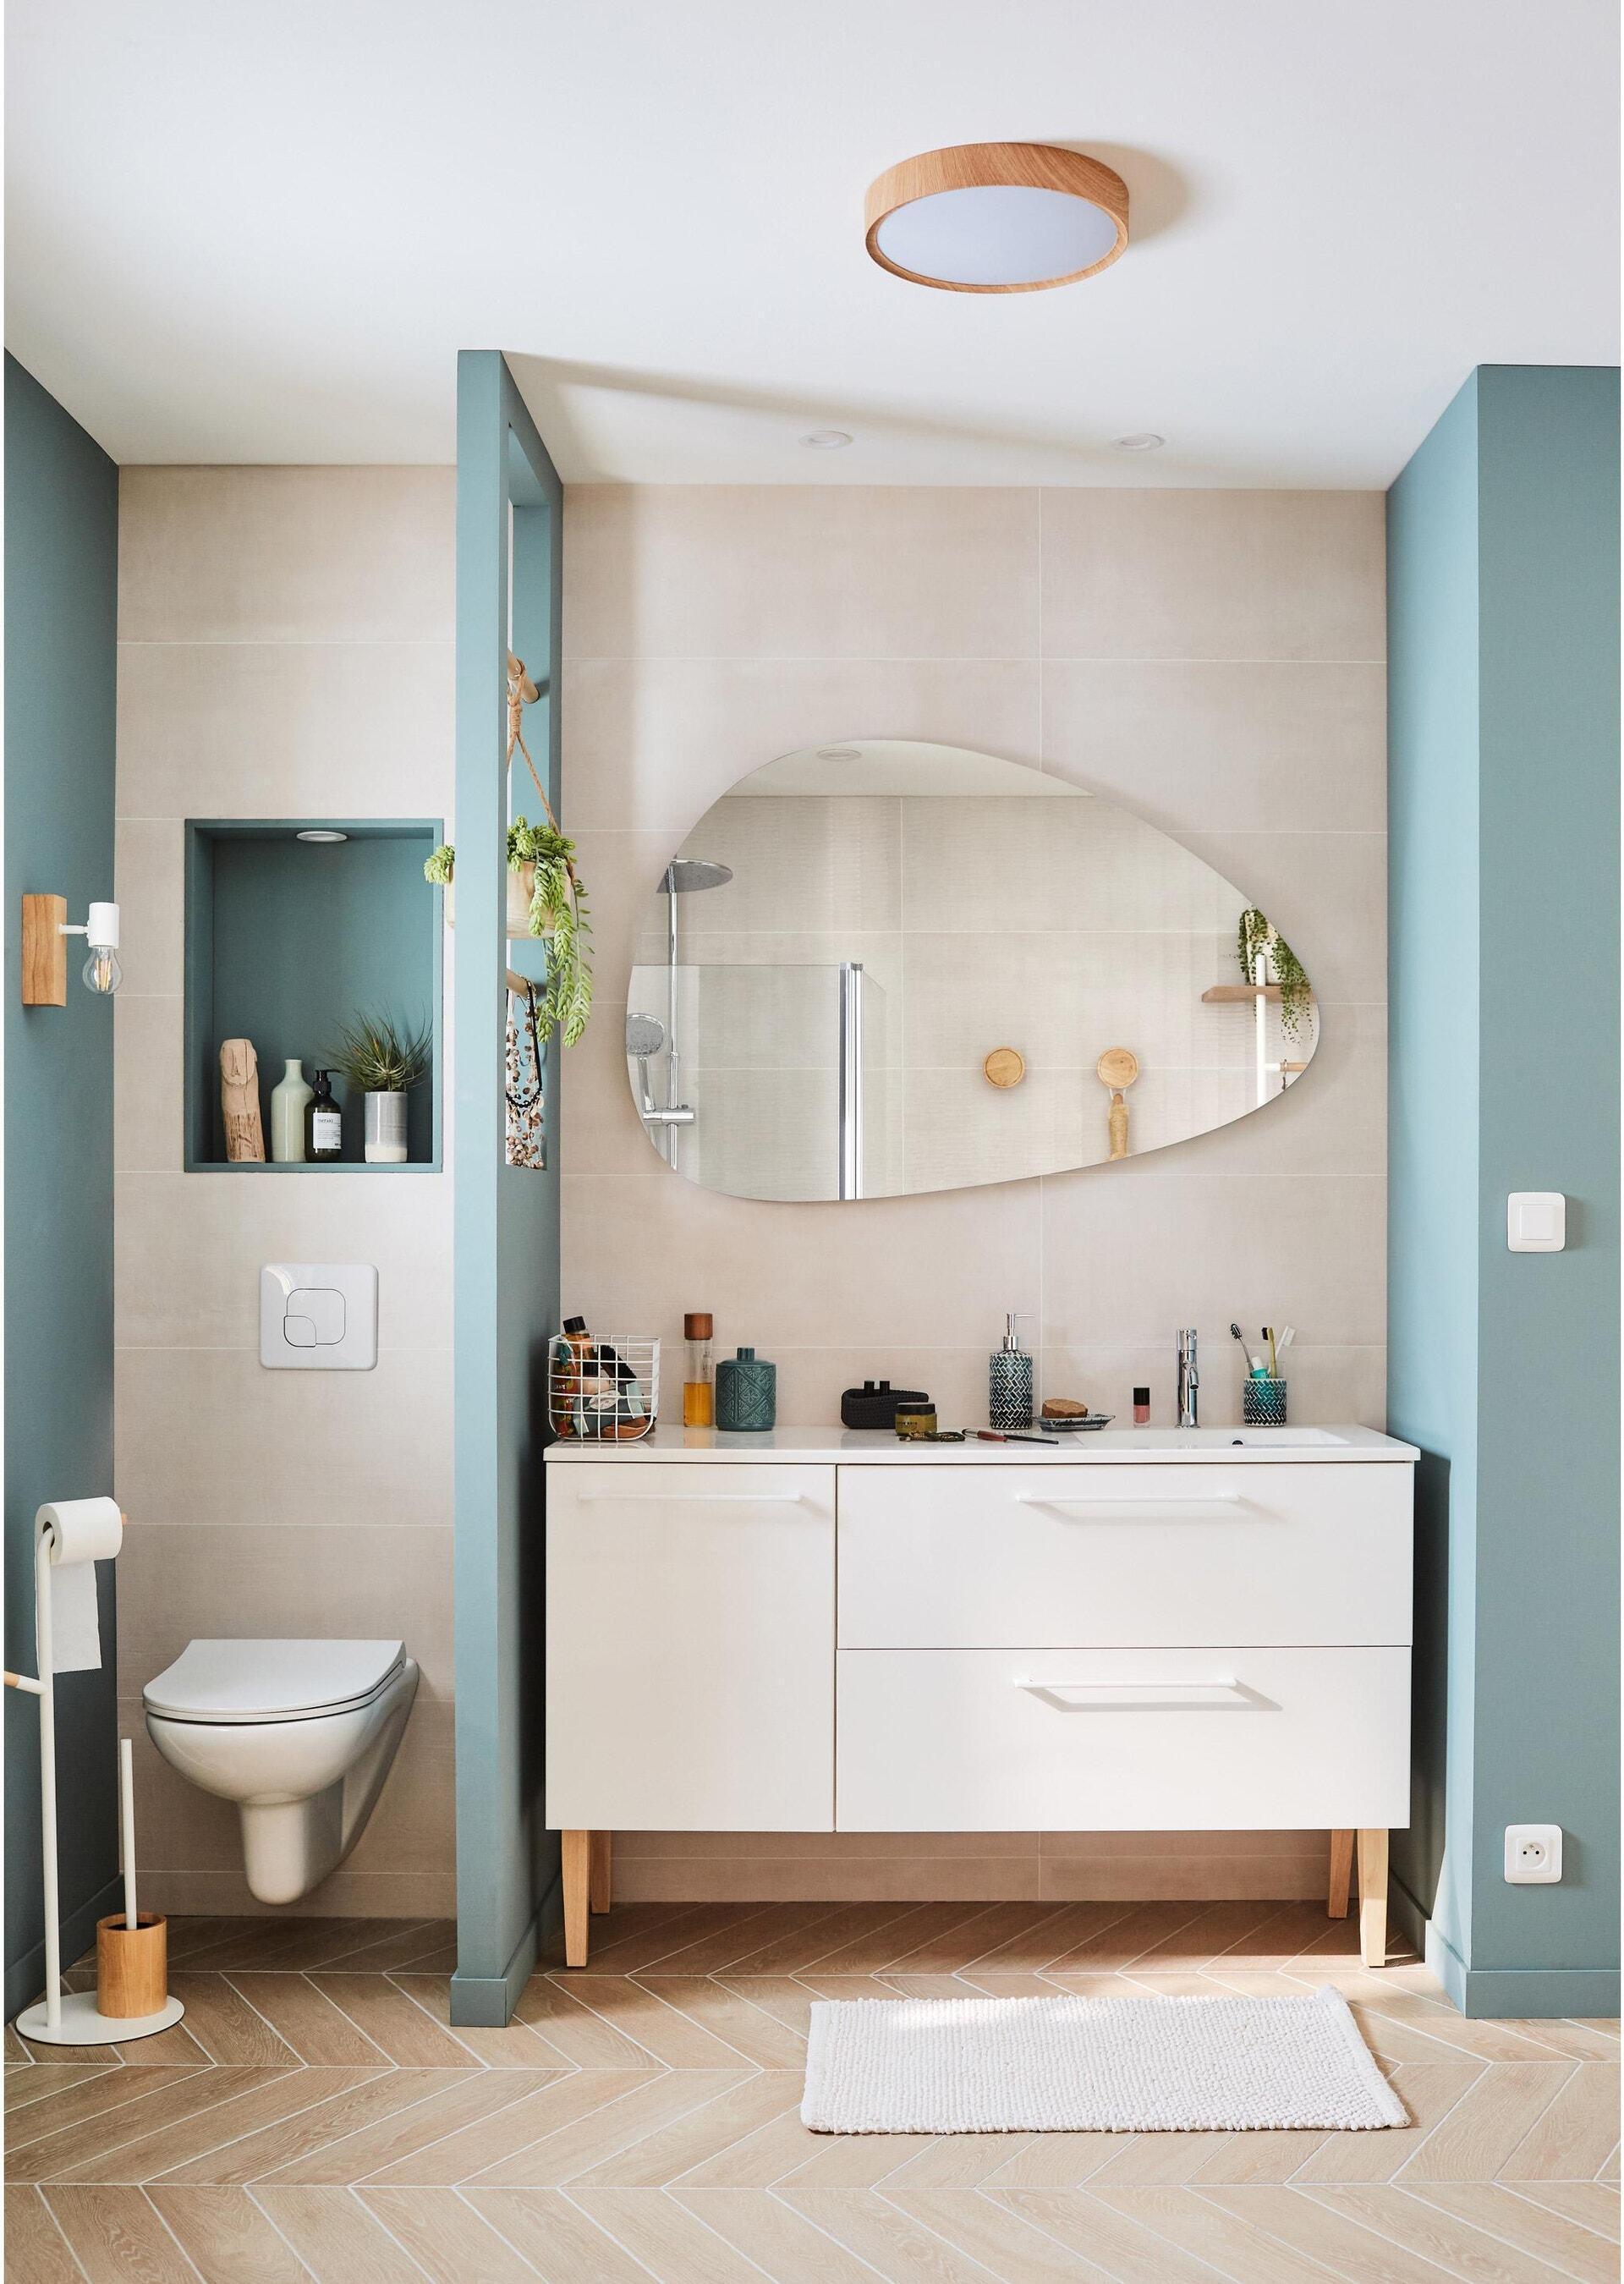 Mobile lavabo L 90 x P 48 x H 58 cm in agglomerato bianco - 4